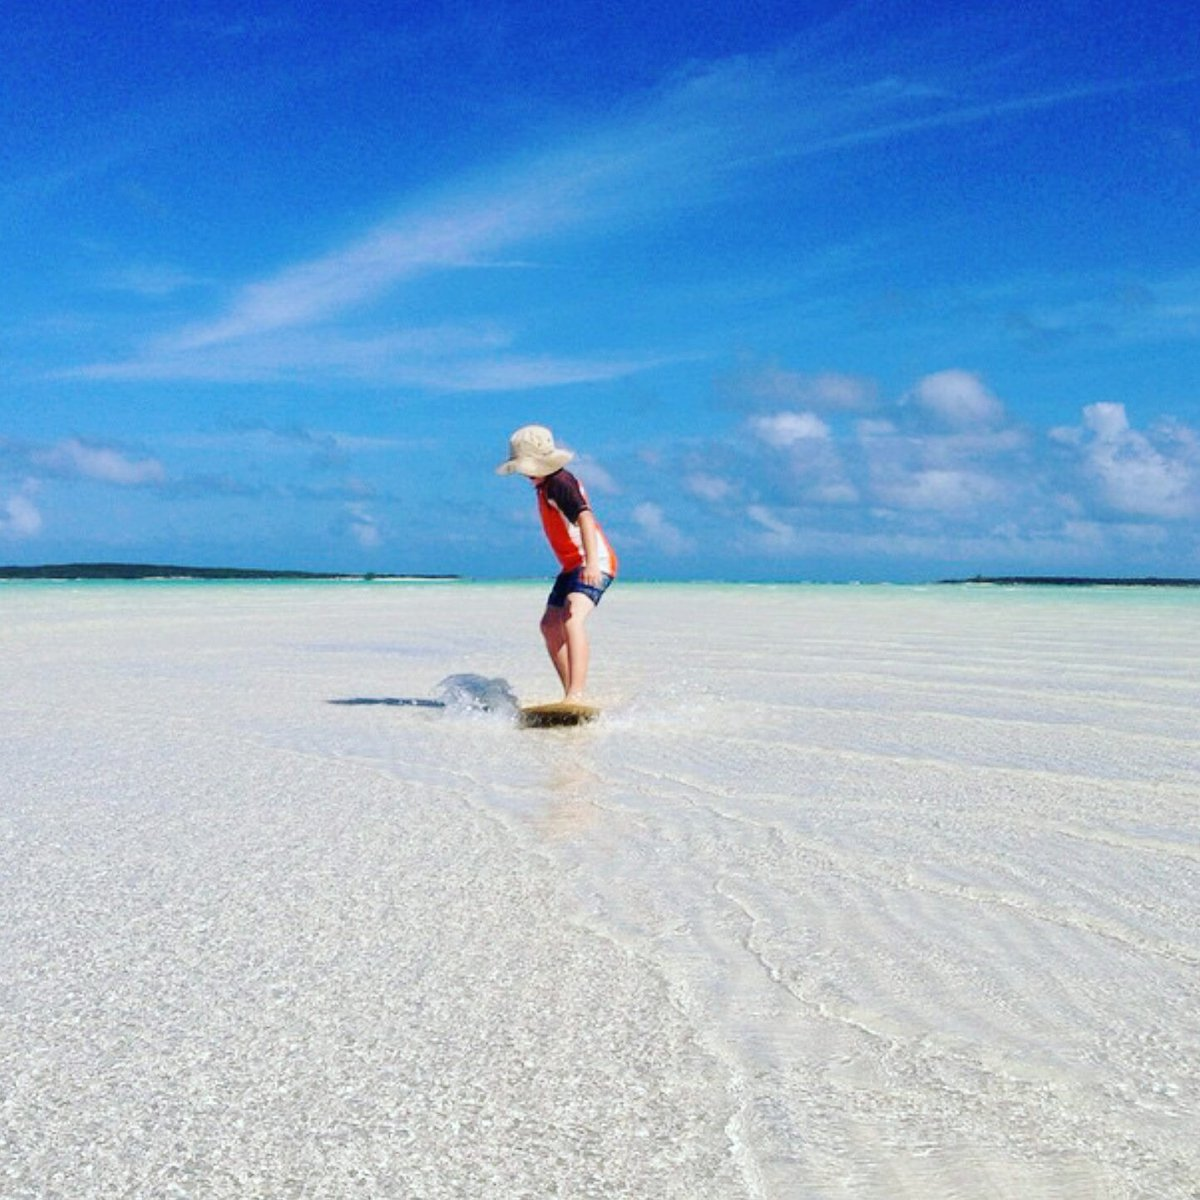 Canuck Palms Exuma On Twitter Skimboarding Across The Sandbars At Cocoplum Beach Bahamas Puresimpleblue Skimculture Skim Mermaids